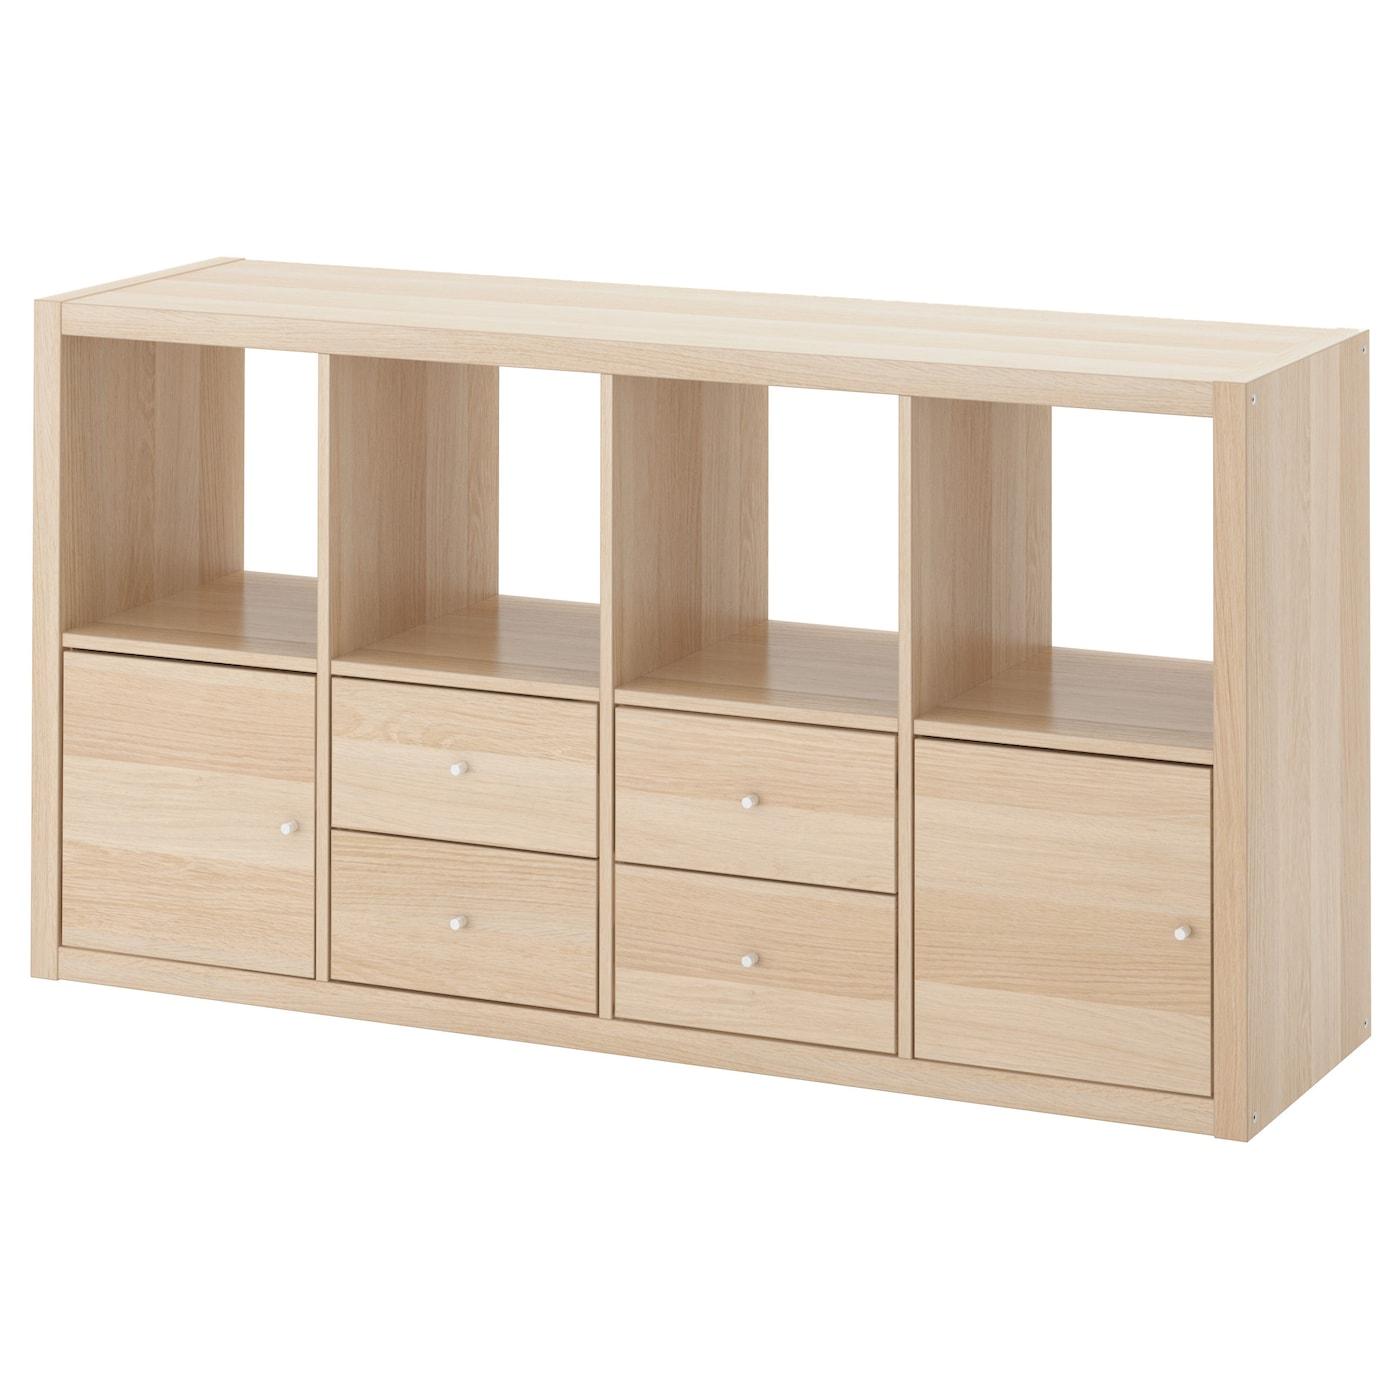 kallax s rie ikea. Black Bedroom Furniture Sets. Home Design Ideas